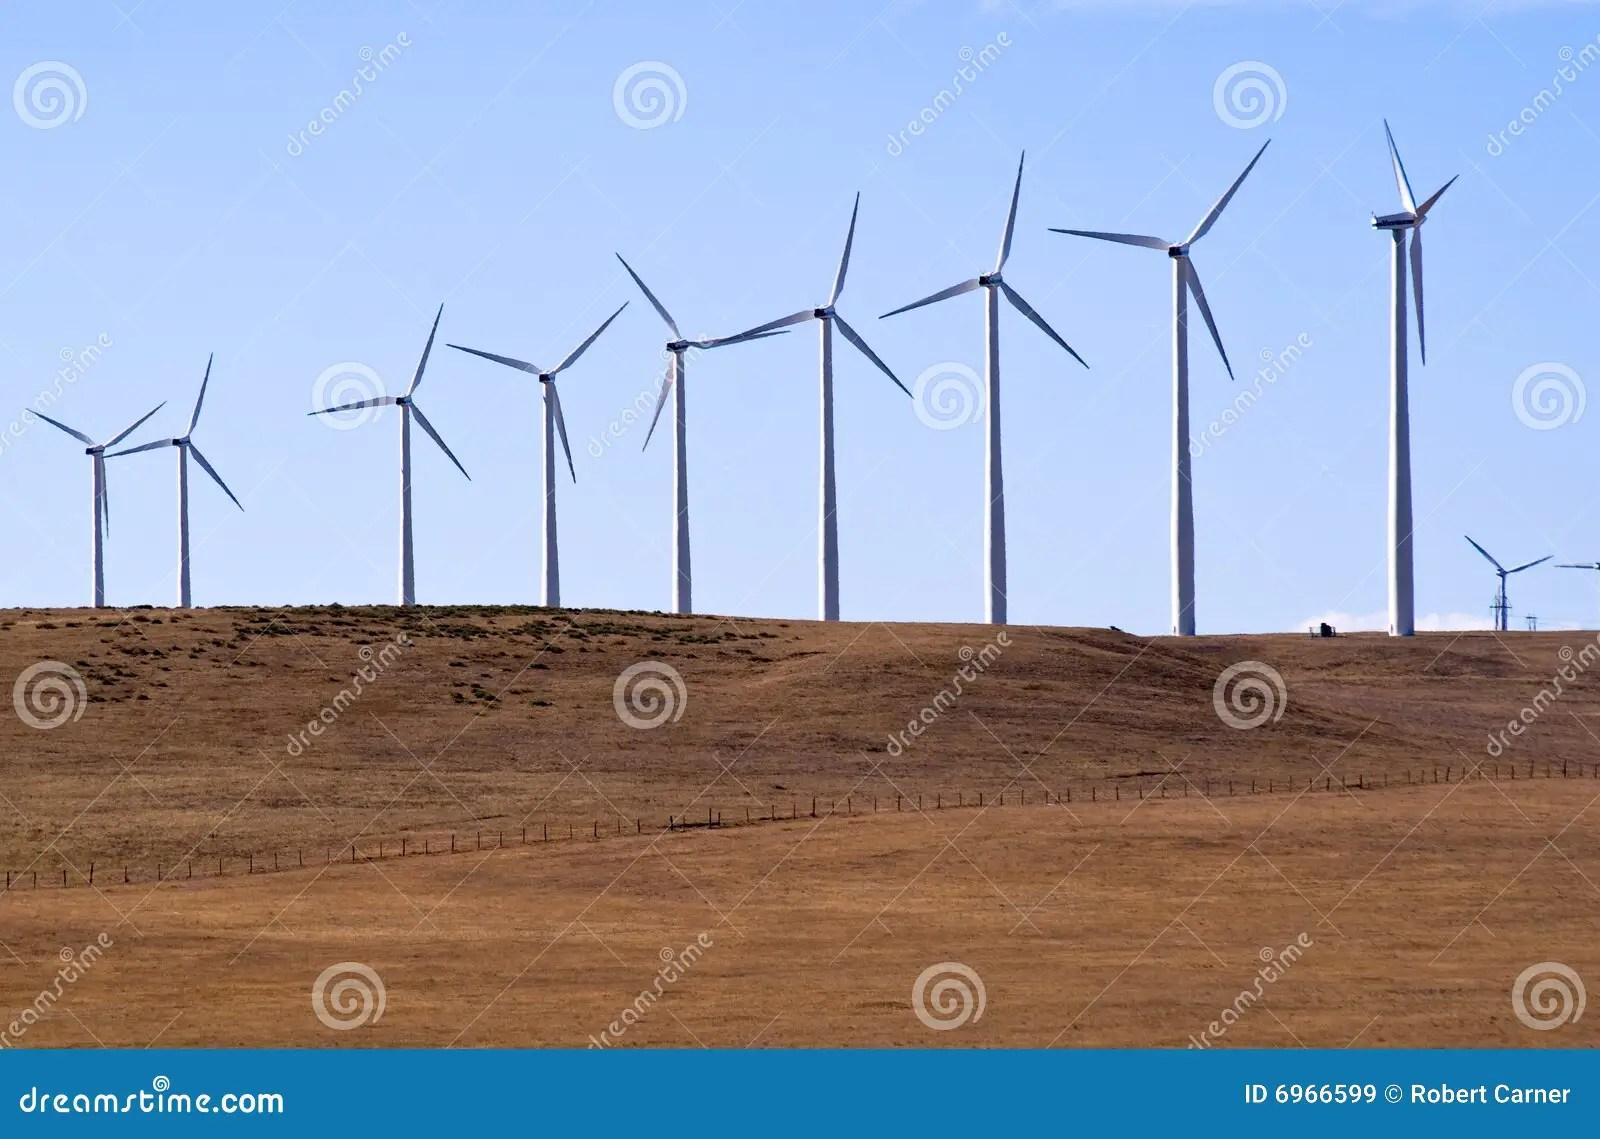 Phase Wind Generator Wiring Diagram Get Free Image About Wiring